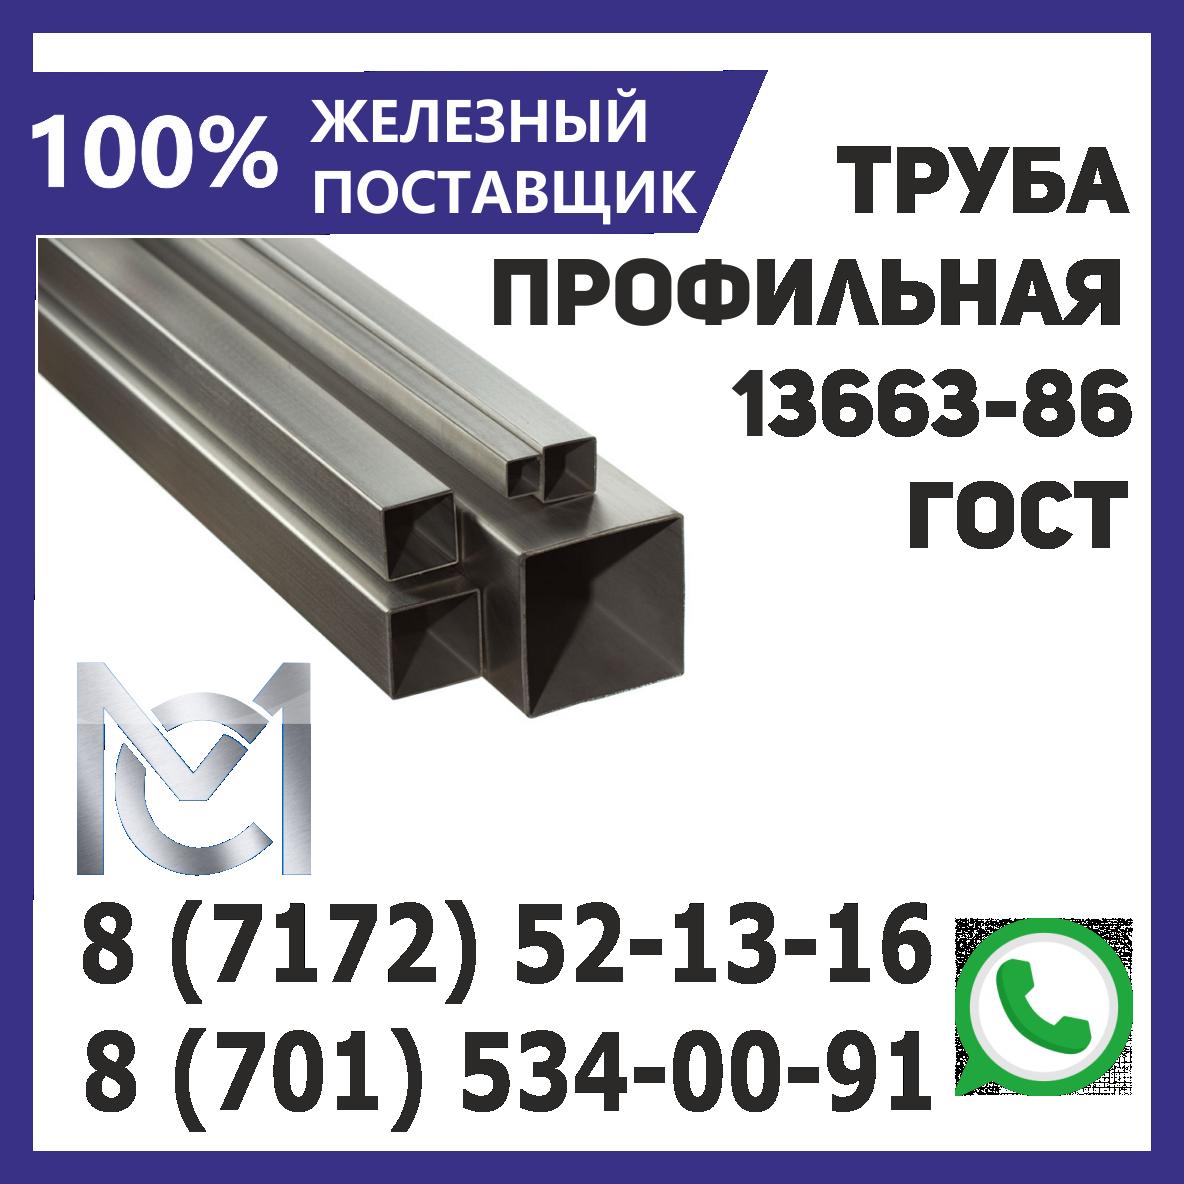 Труба профильная Д 40х40 1,5мм ГОСТ 13663-86 стальная 6 метров